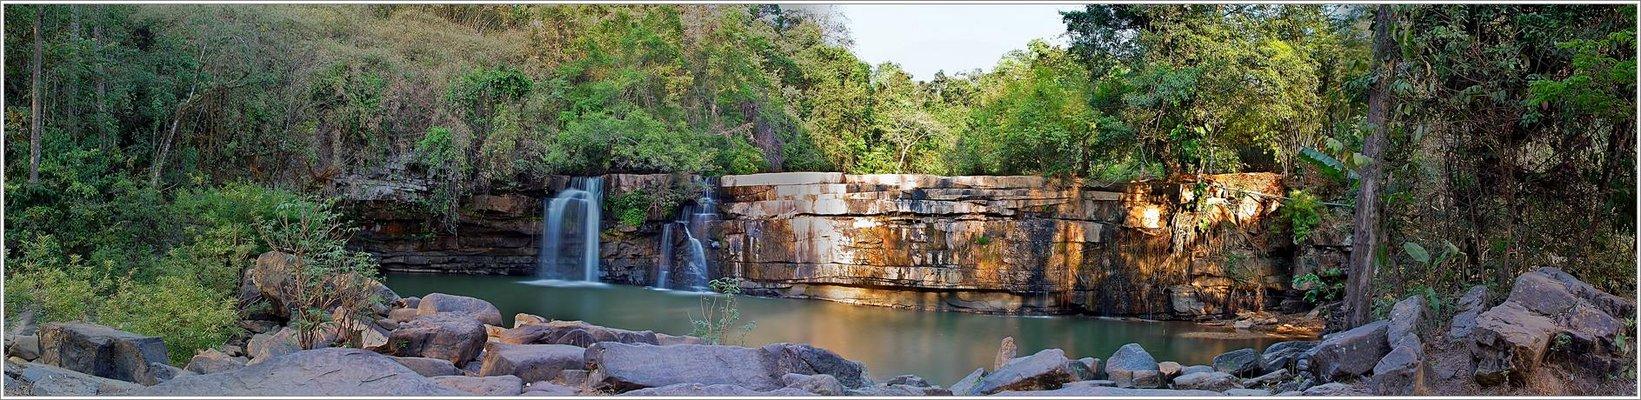 Sidit Waterfall